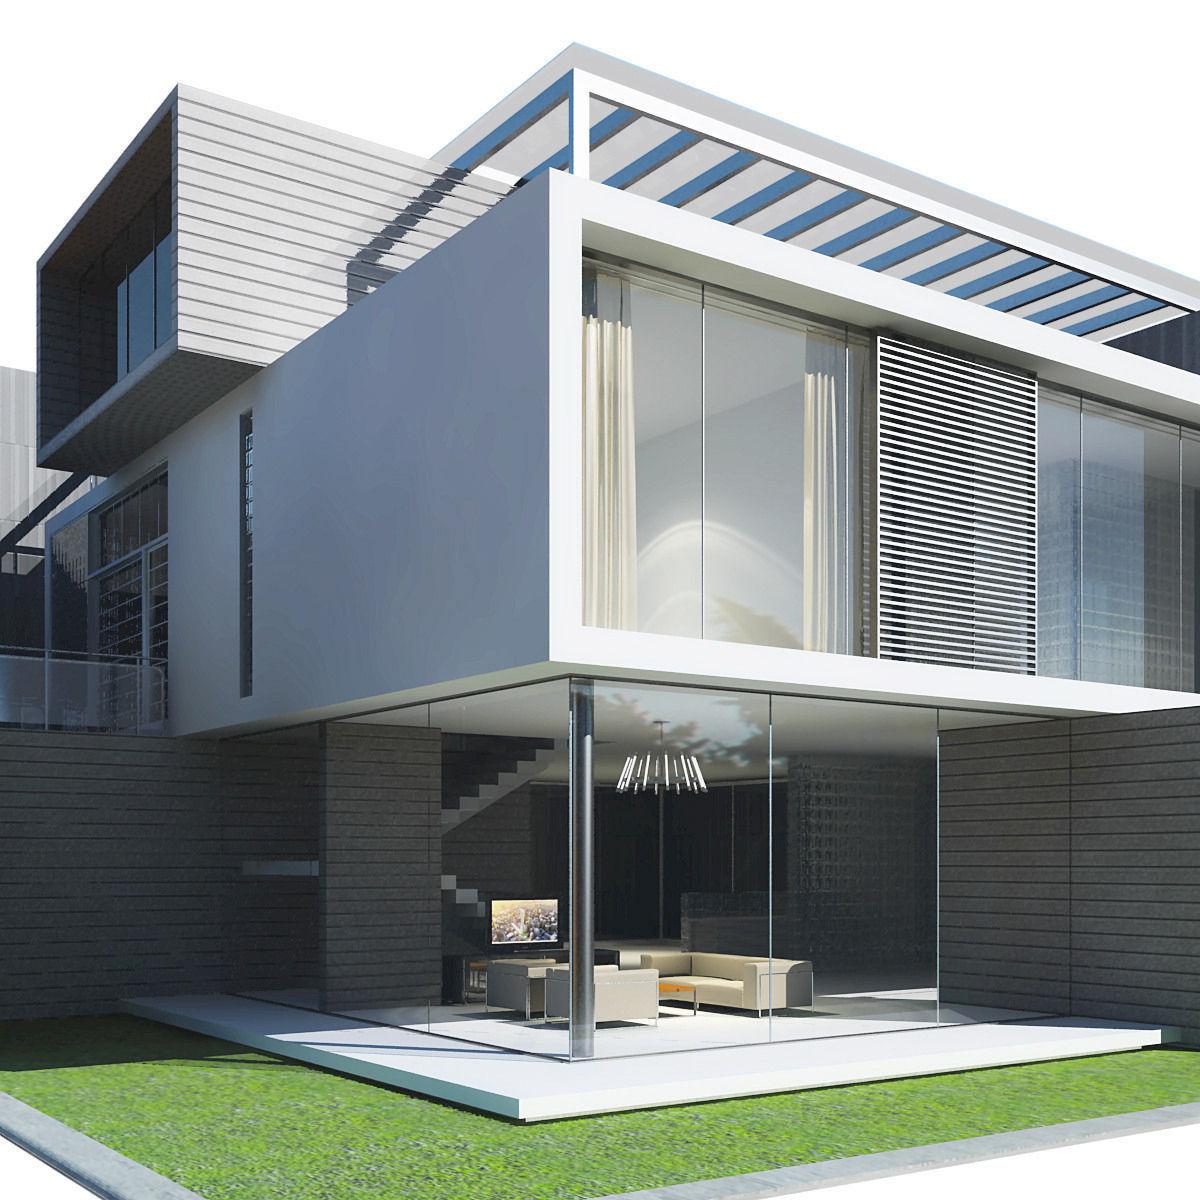 Modern House 3D Model M OBJ 3DS FB Grader.com - ^